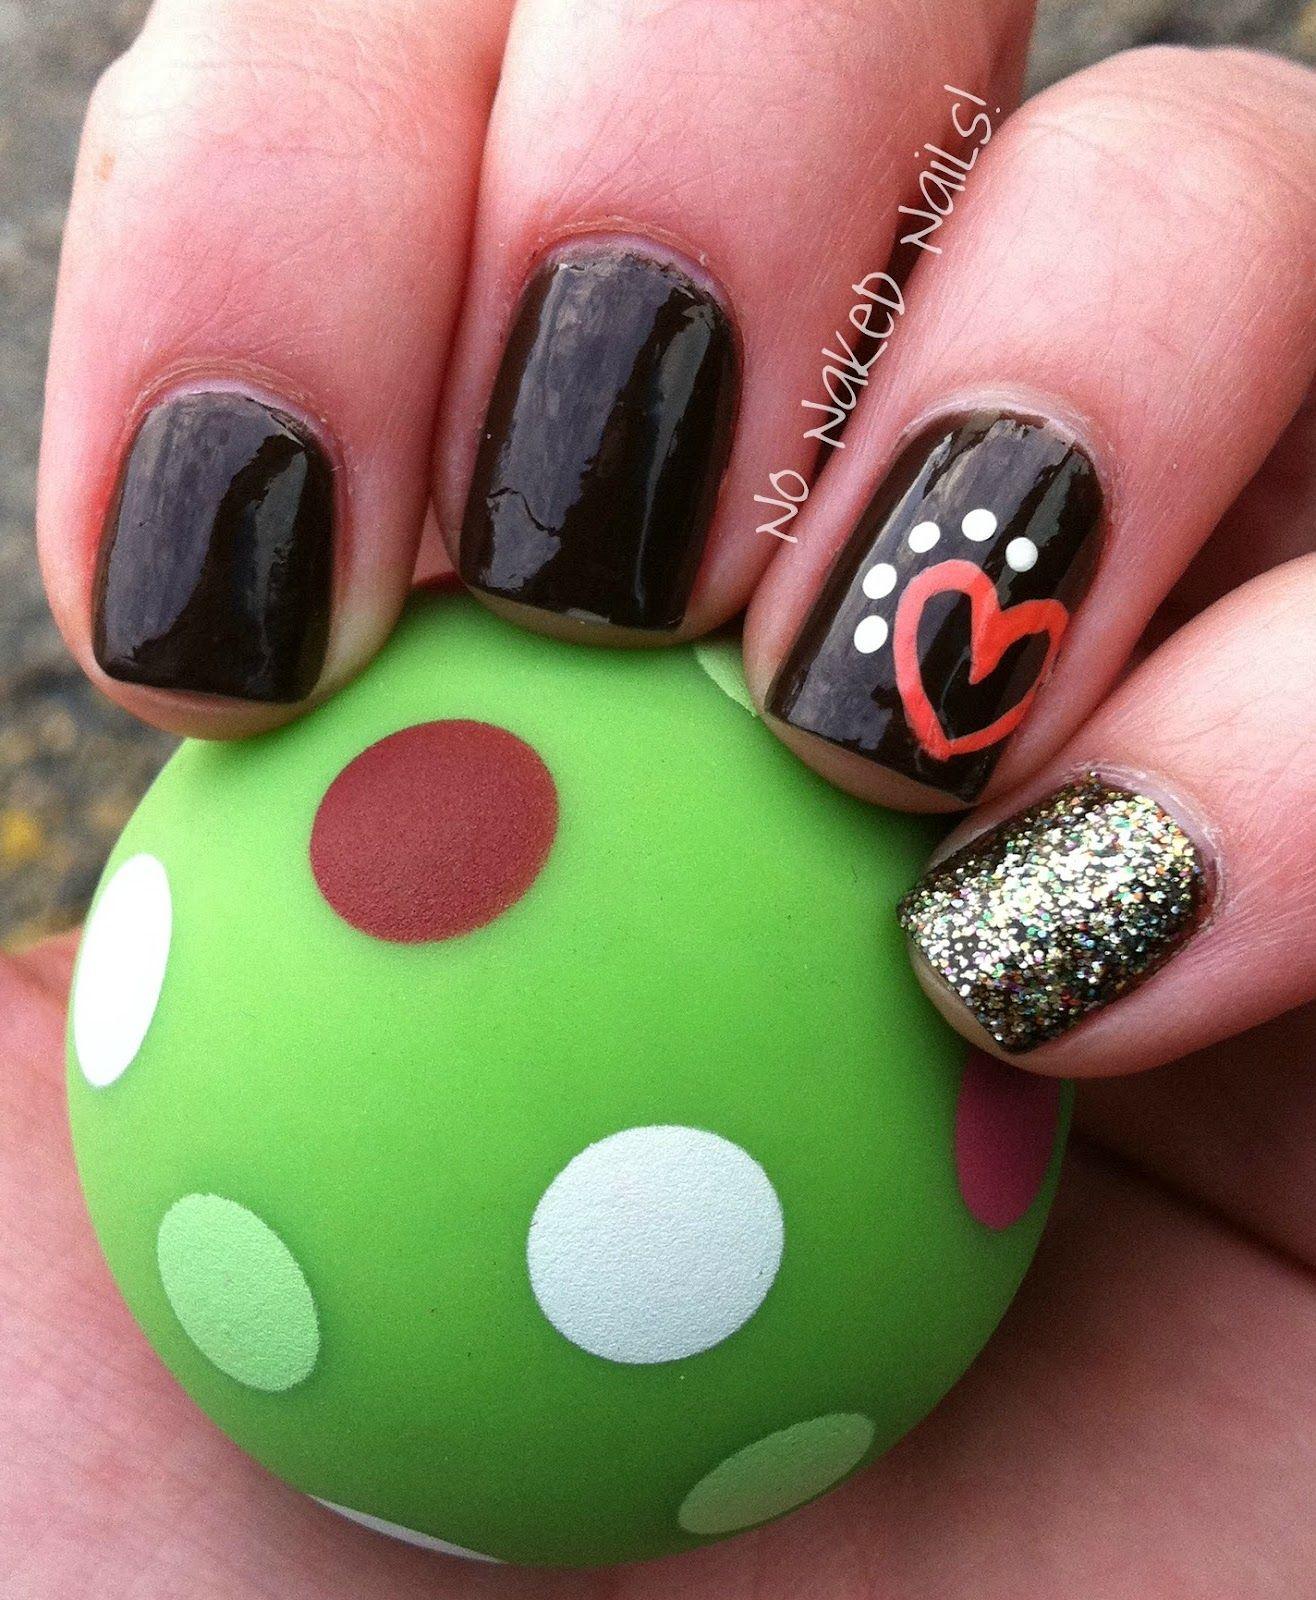 Fun Fall Nail Designs: Fun Fall Nails! Brown, Coral, Glitter! Let's Get Thankful